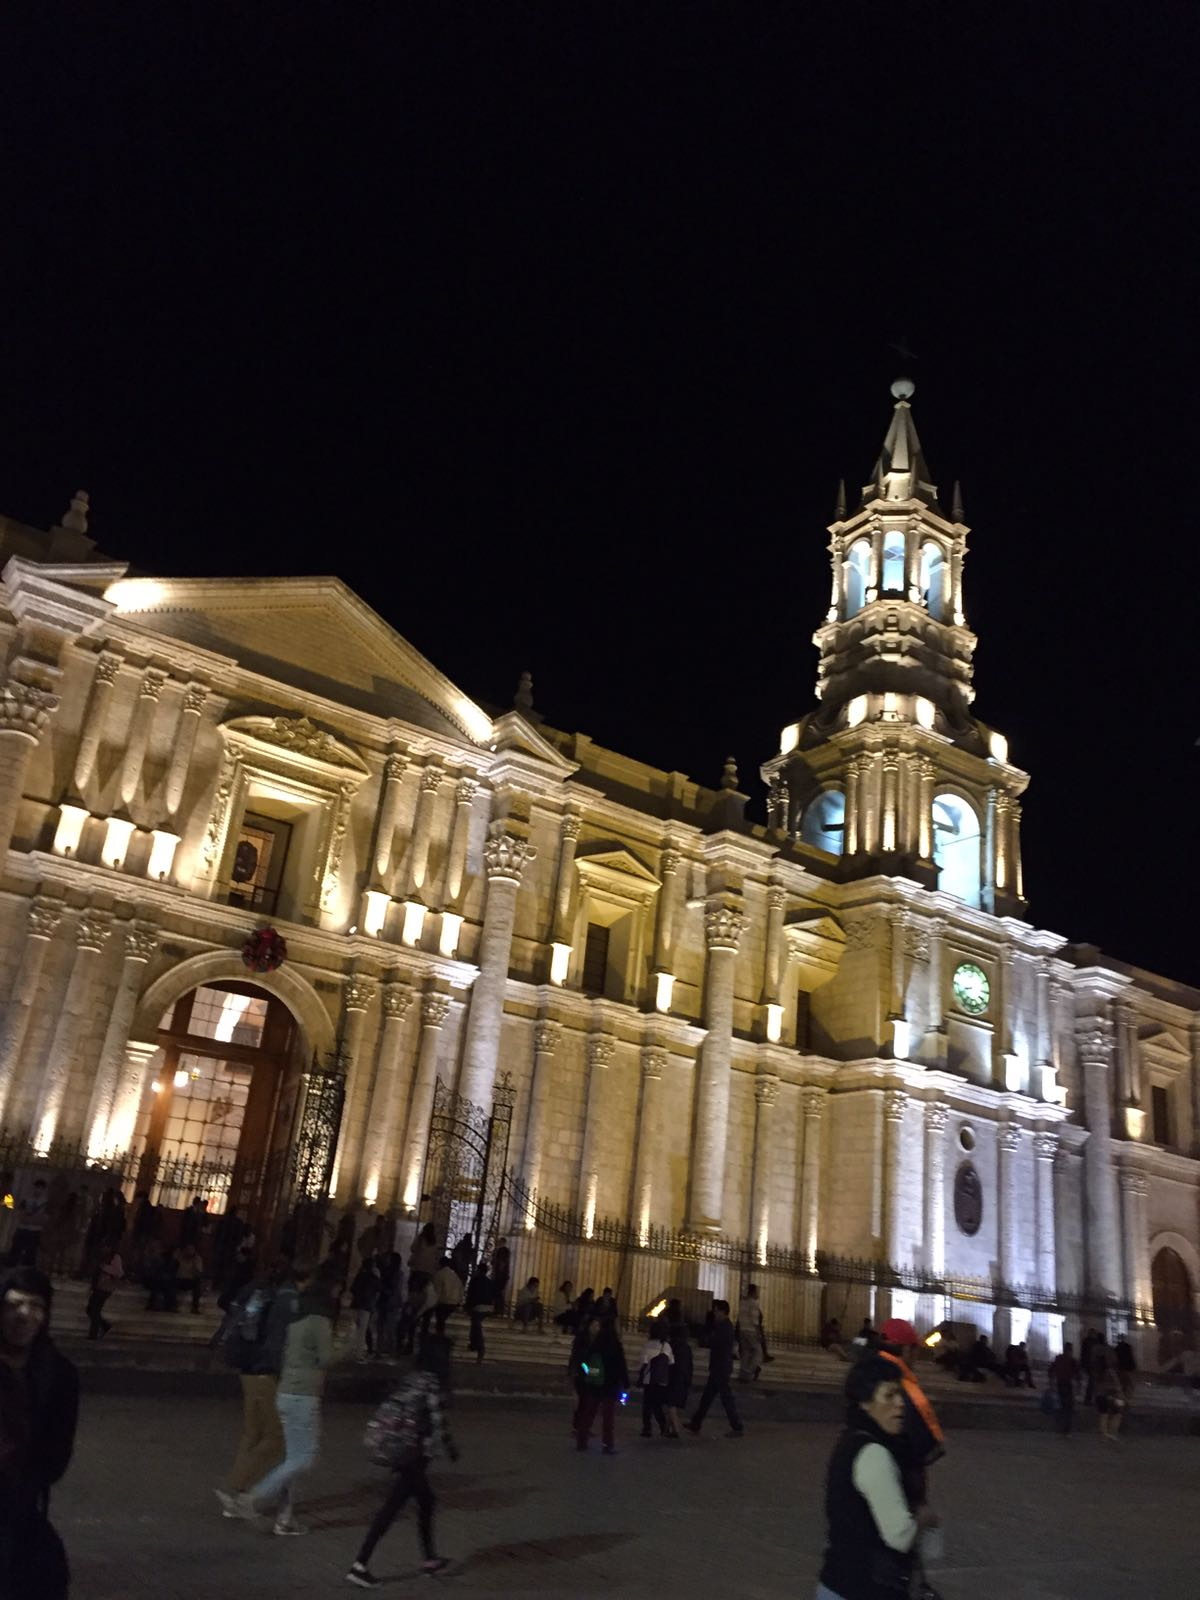 Dallas, Elana x 2 - Arequipa & Colca - Arequipa Cathedral.jpg